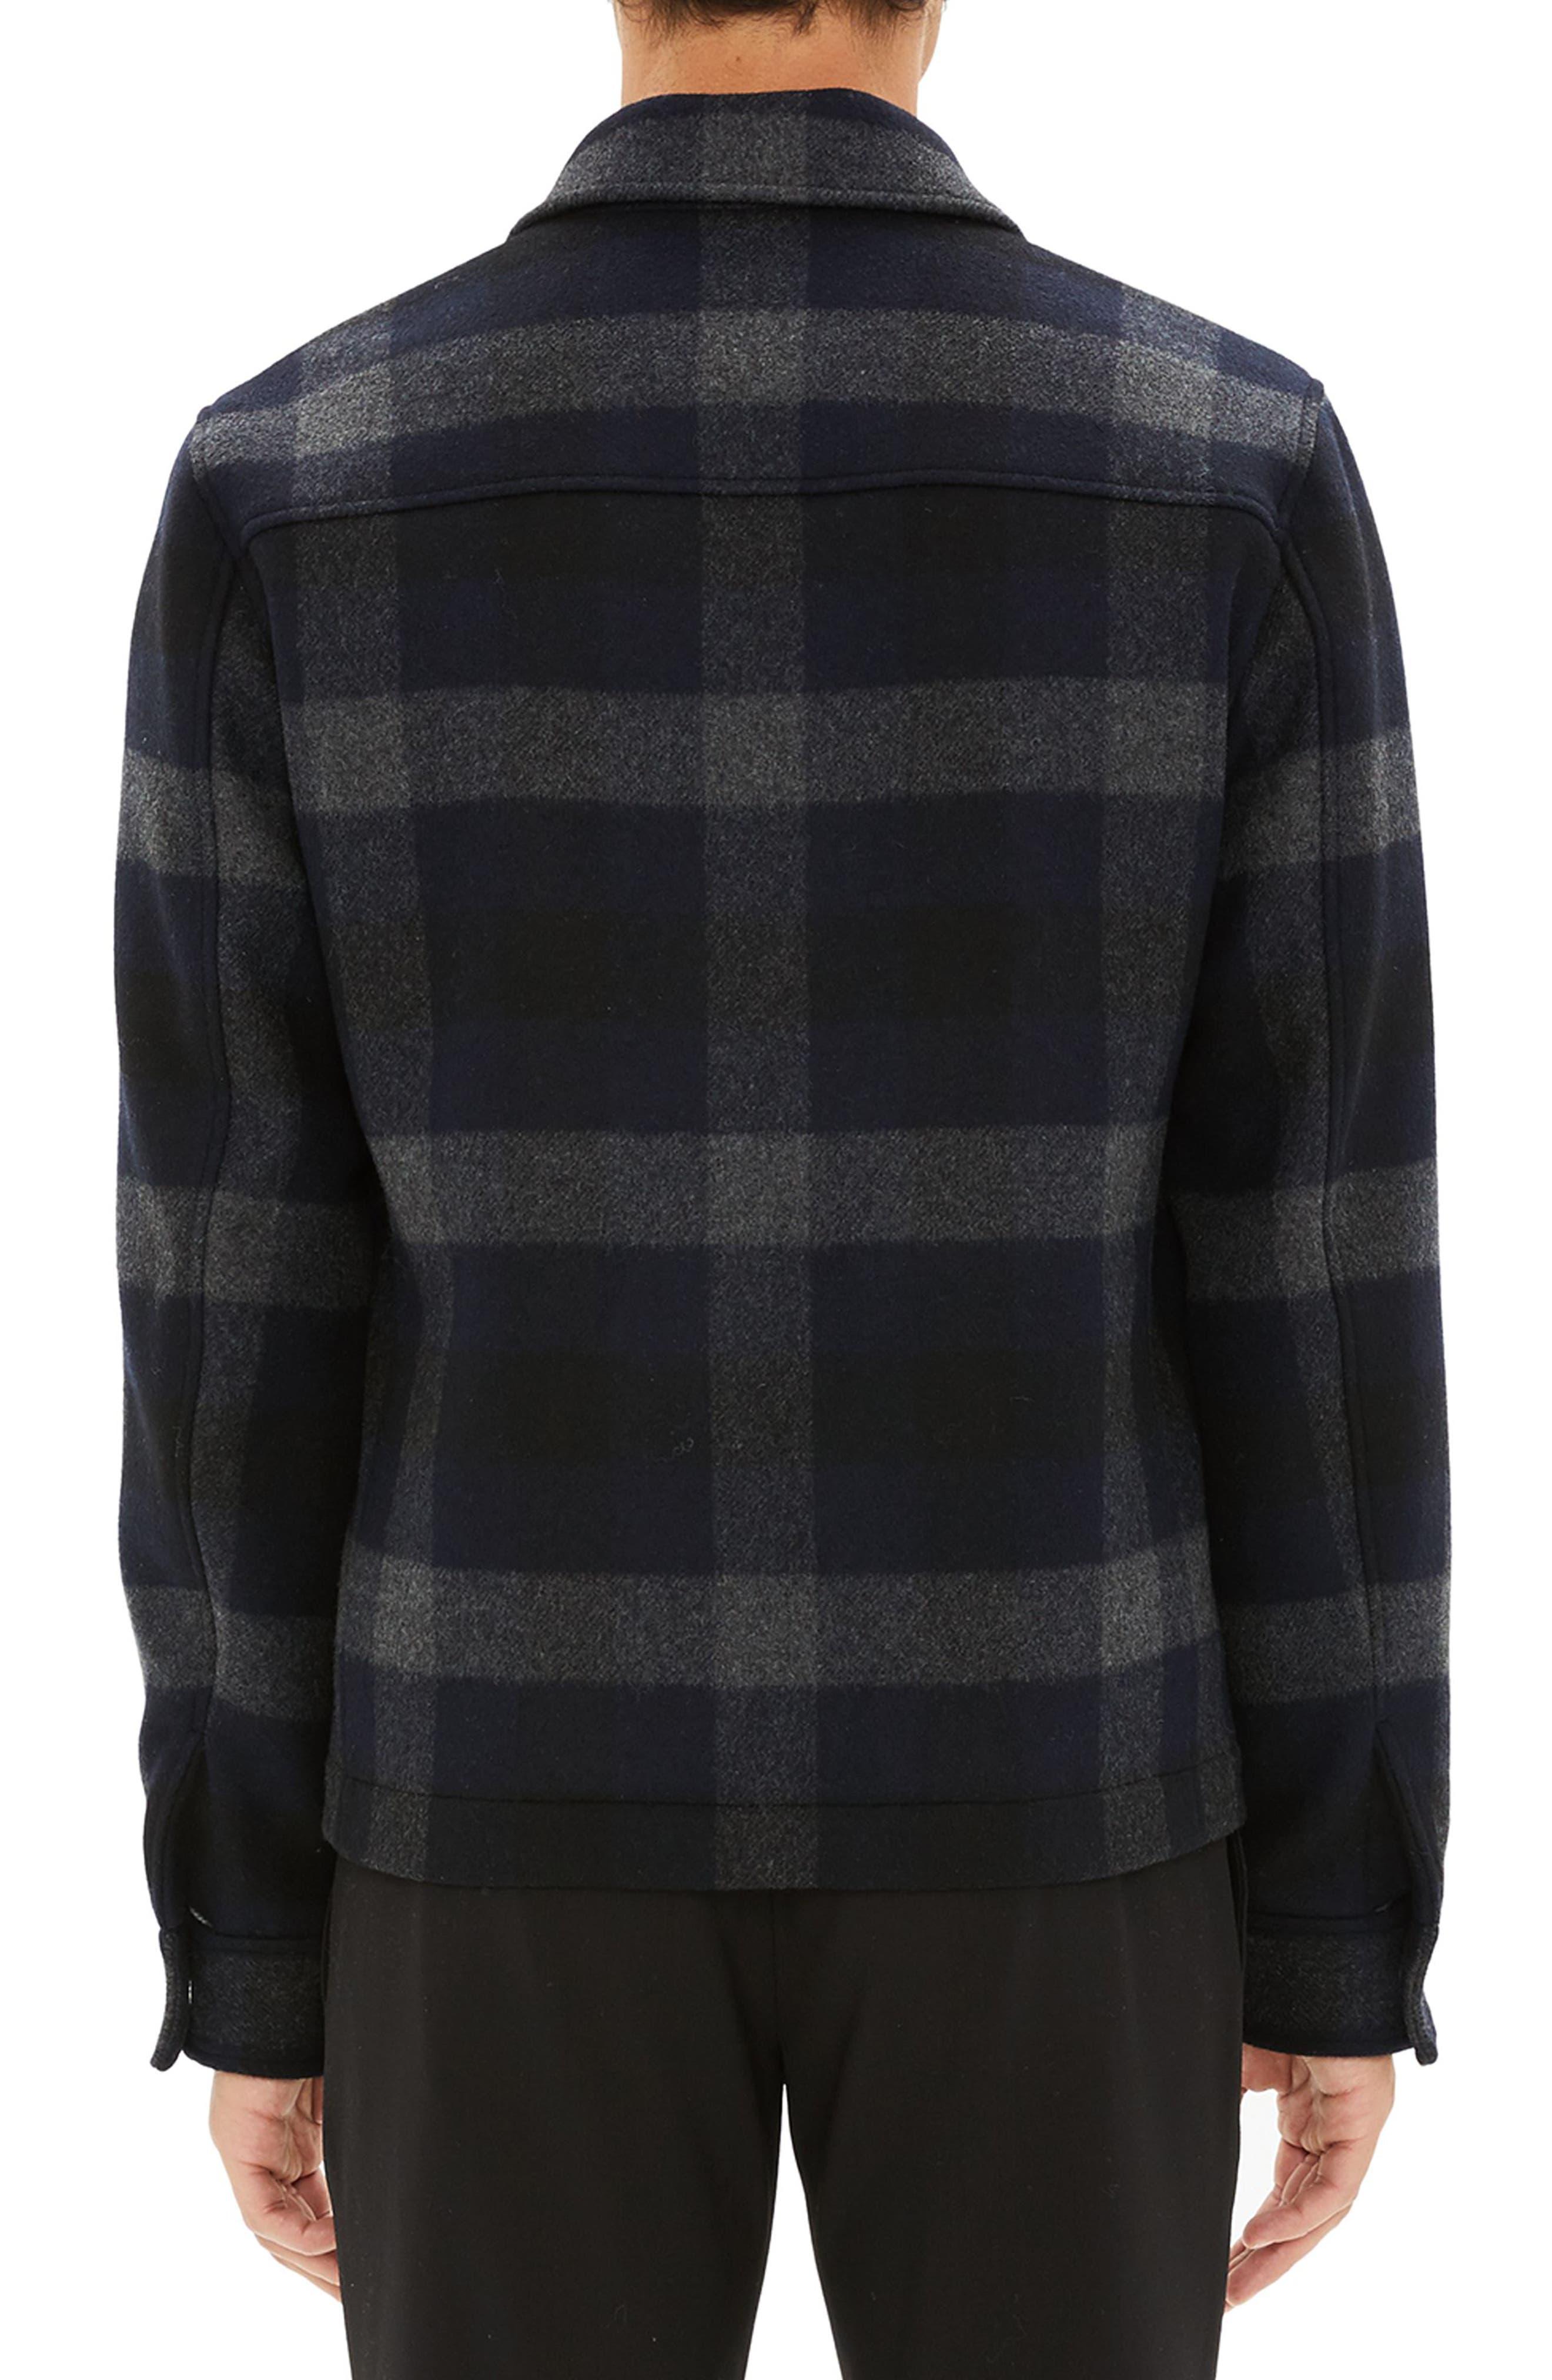 Wyatt Regular Fit Plaid Wool Shirt Jacket,                             Alternate thumbnail 2, color,                             017